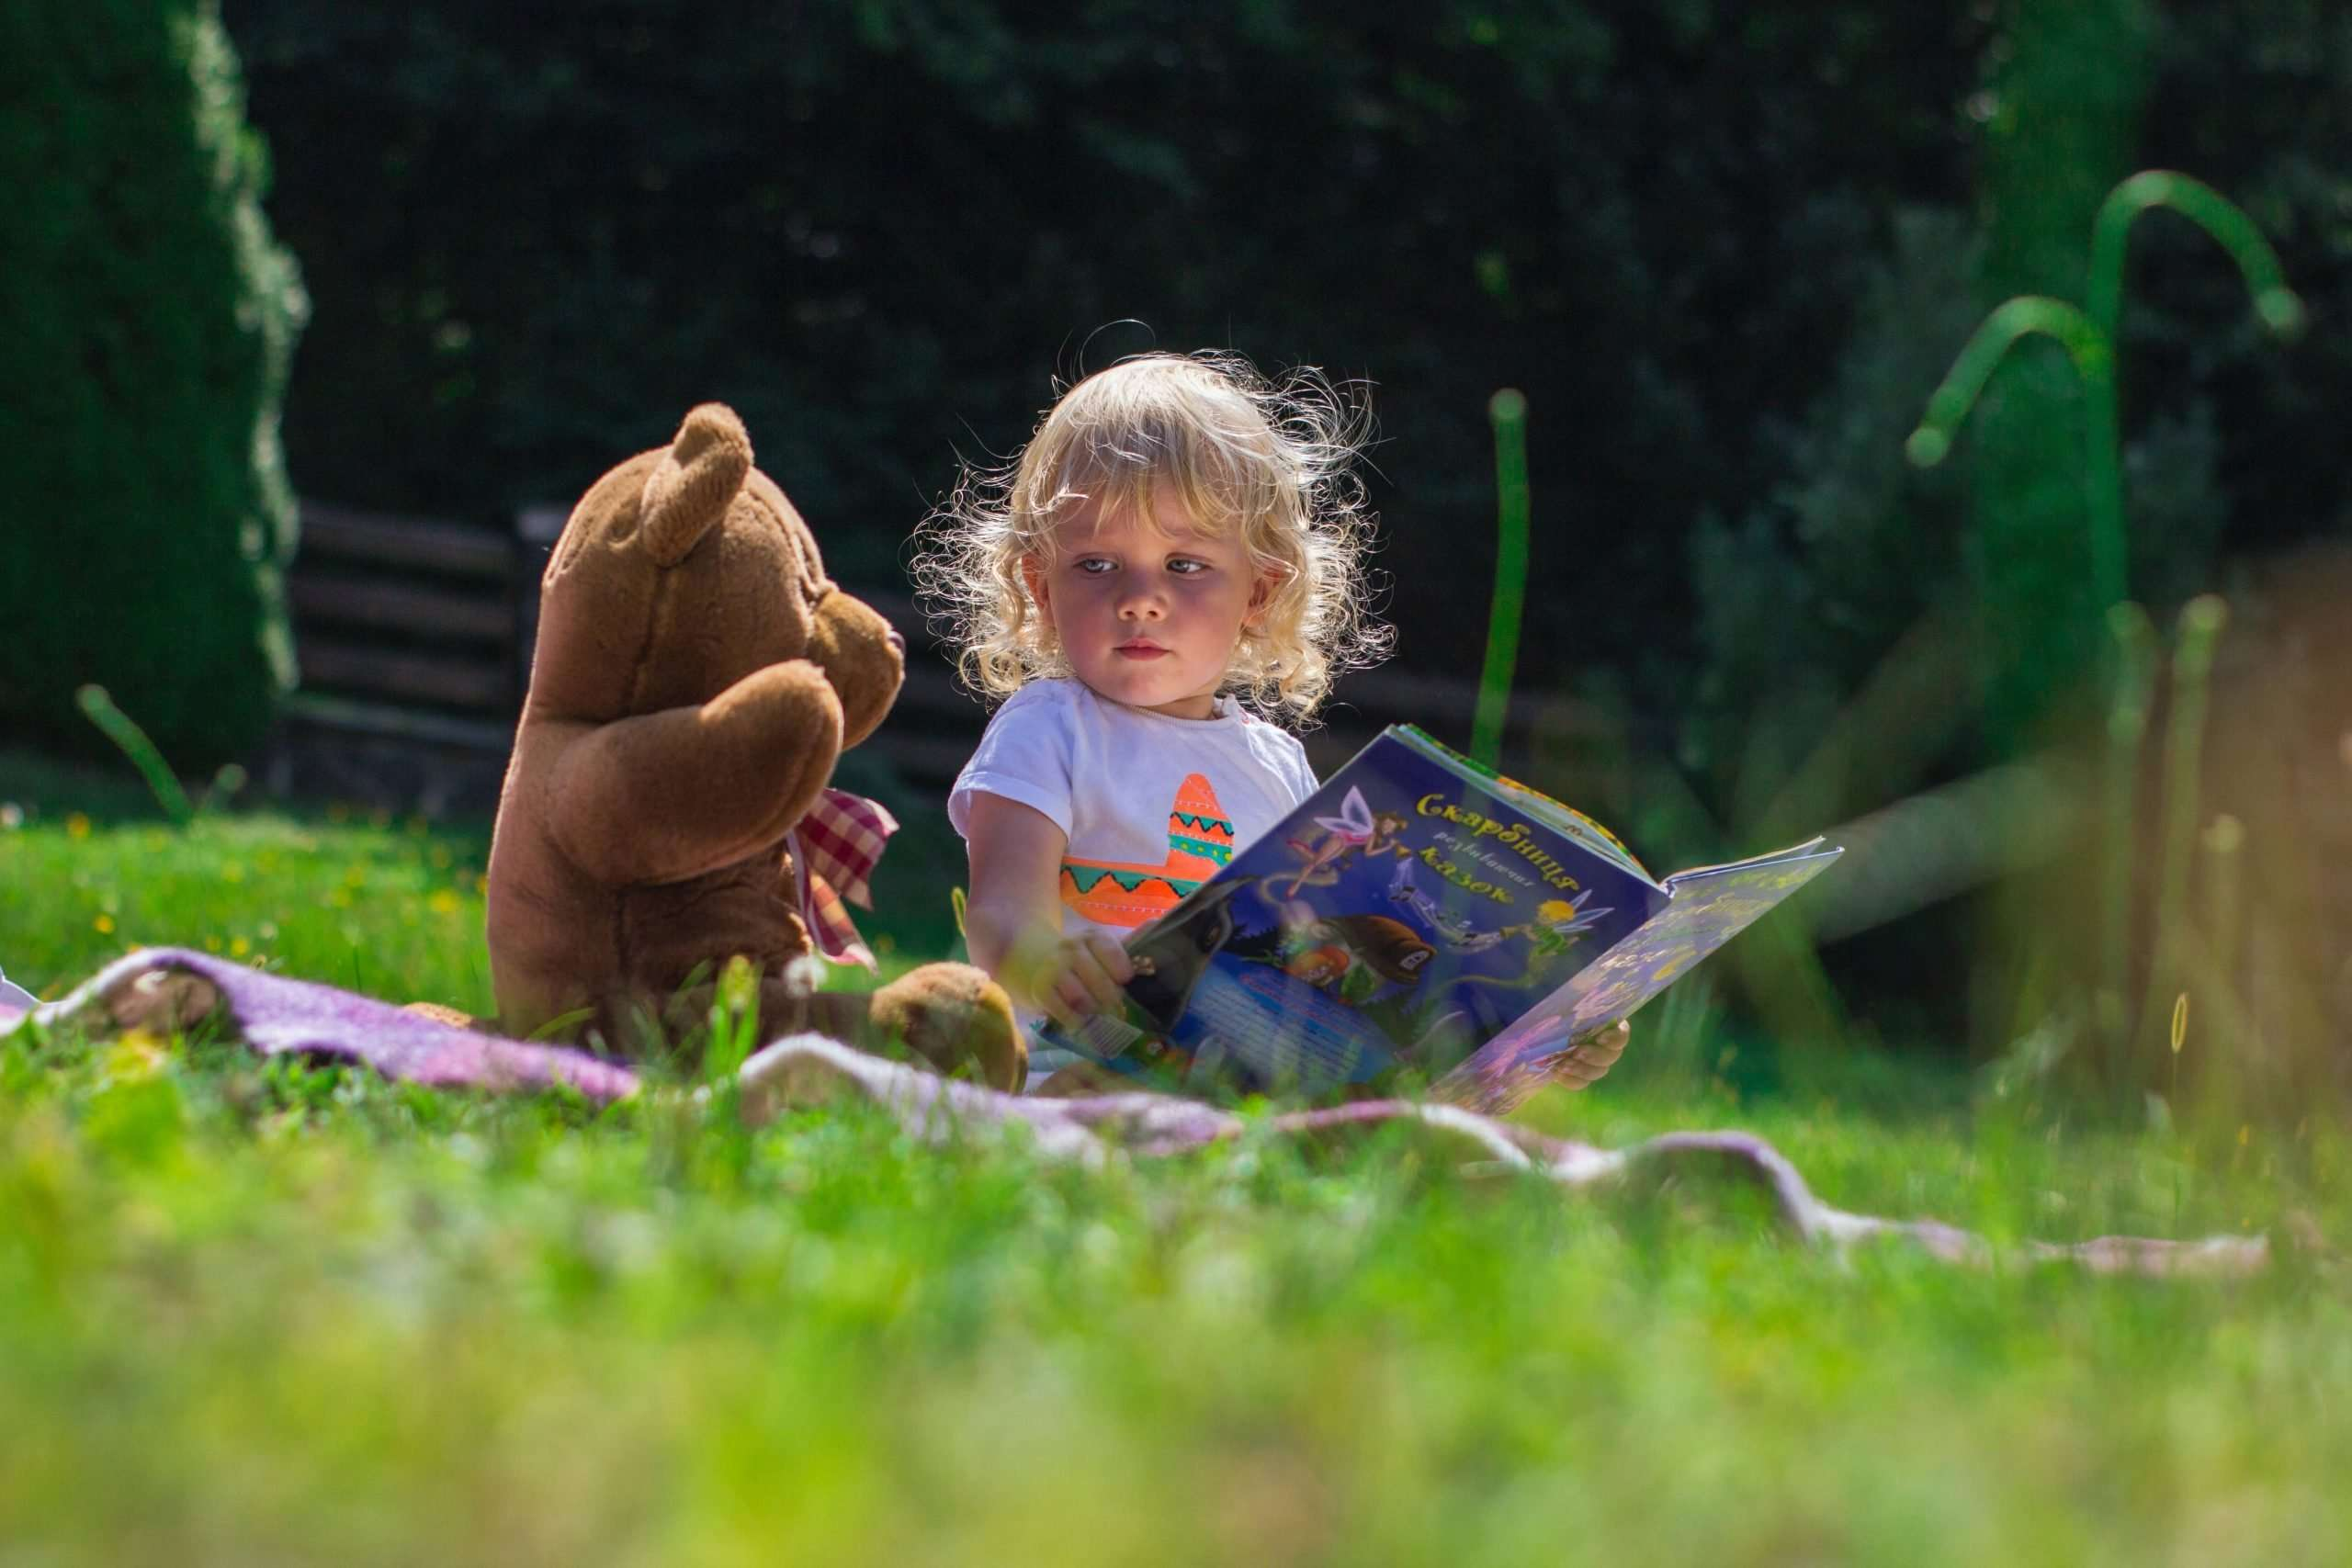 Best ideas to play with teddy bear